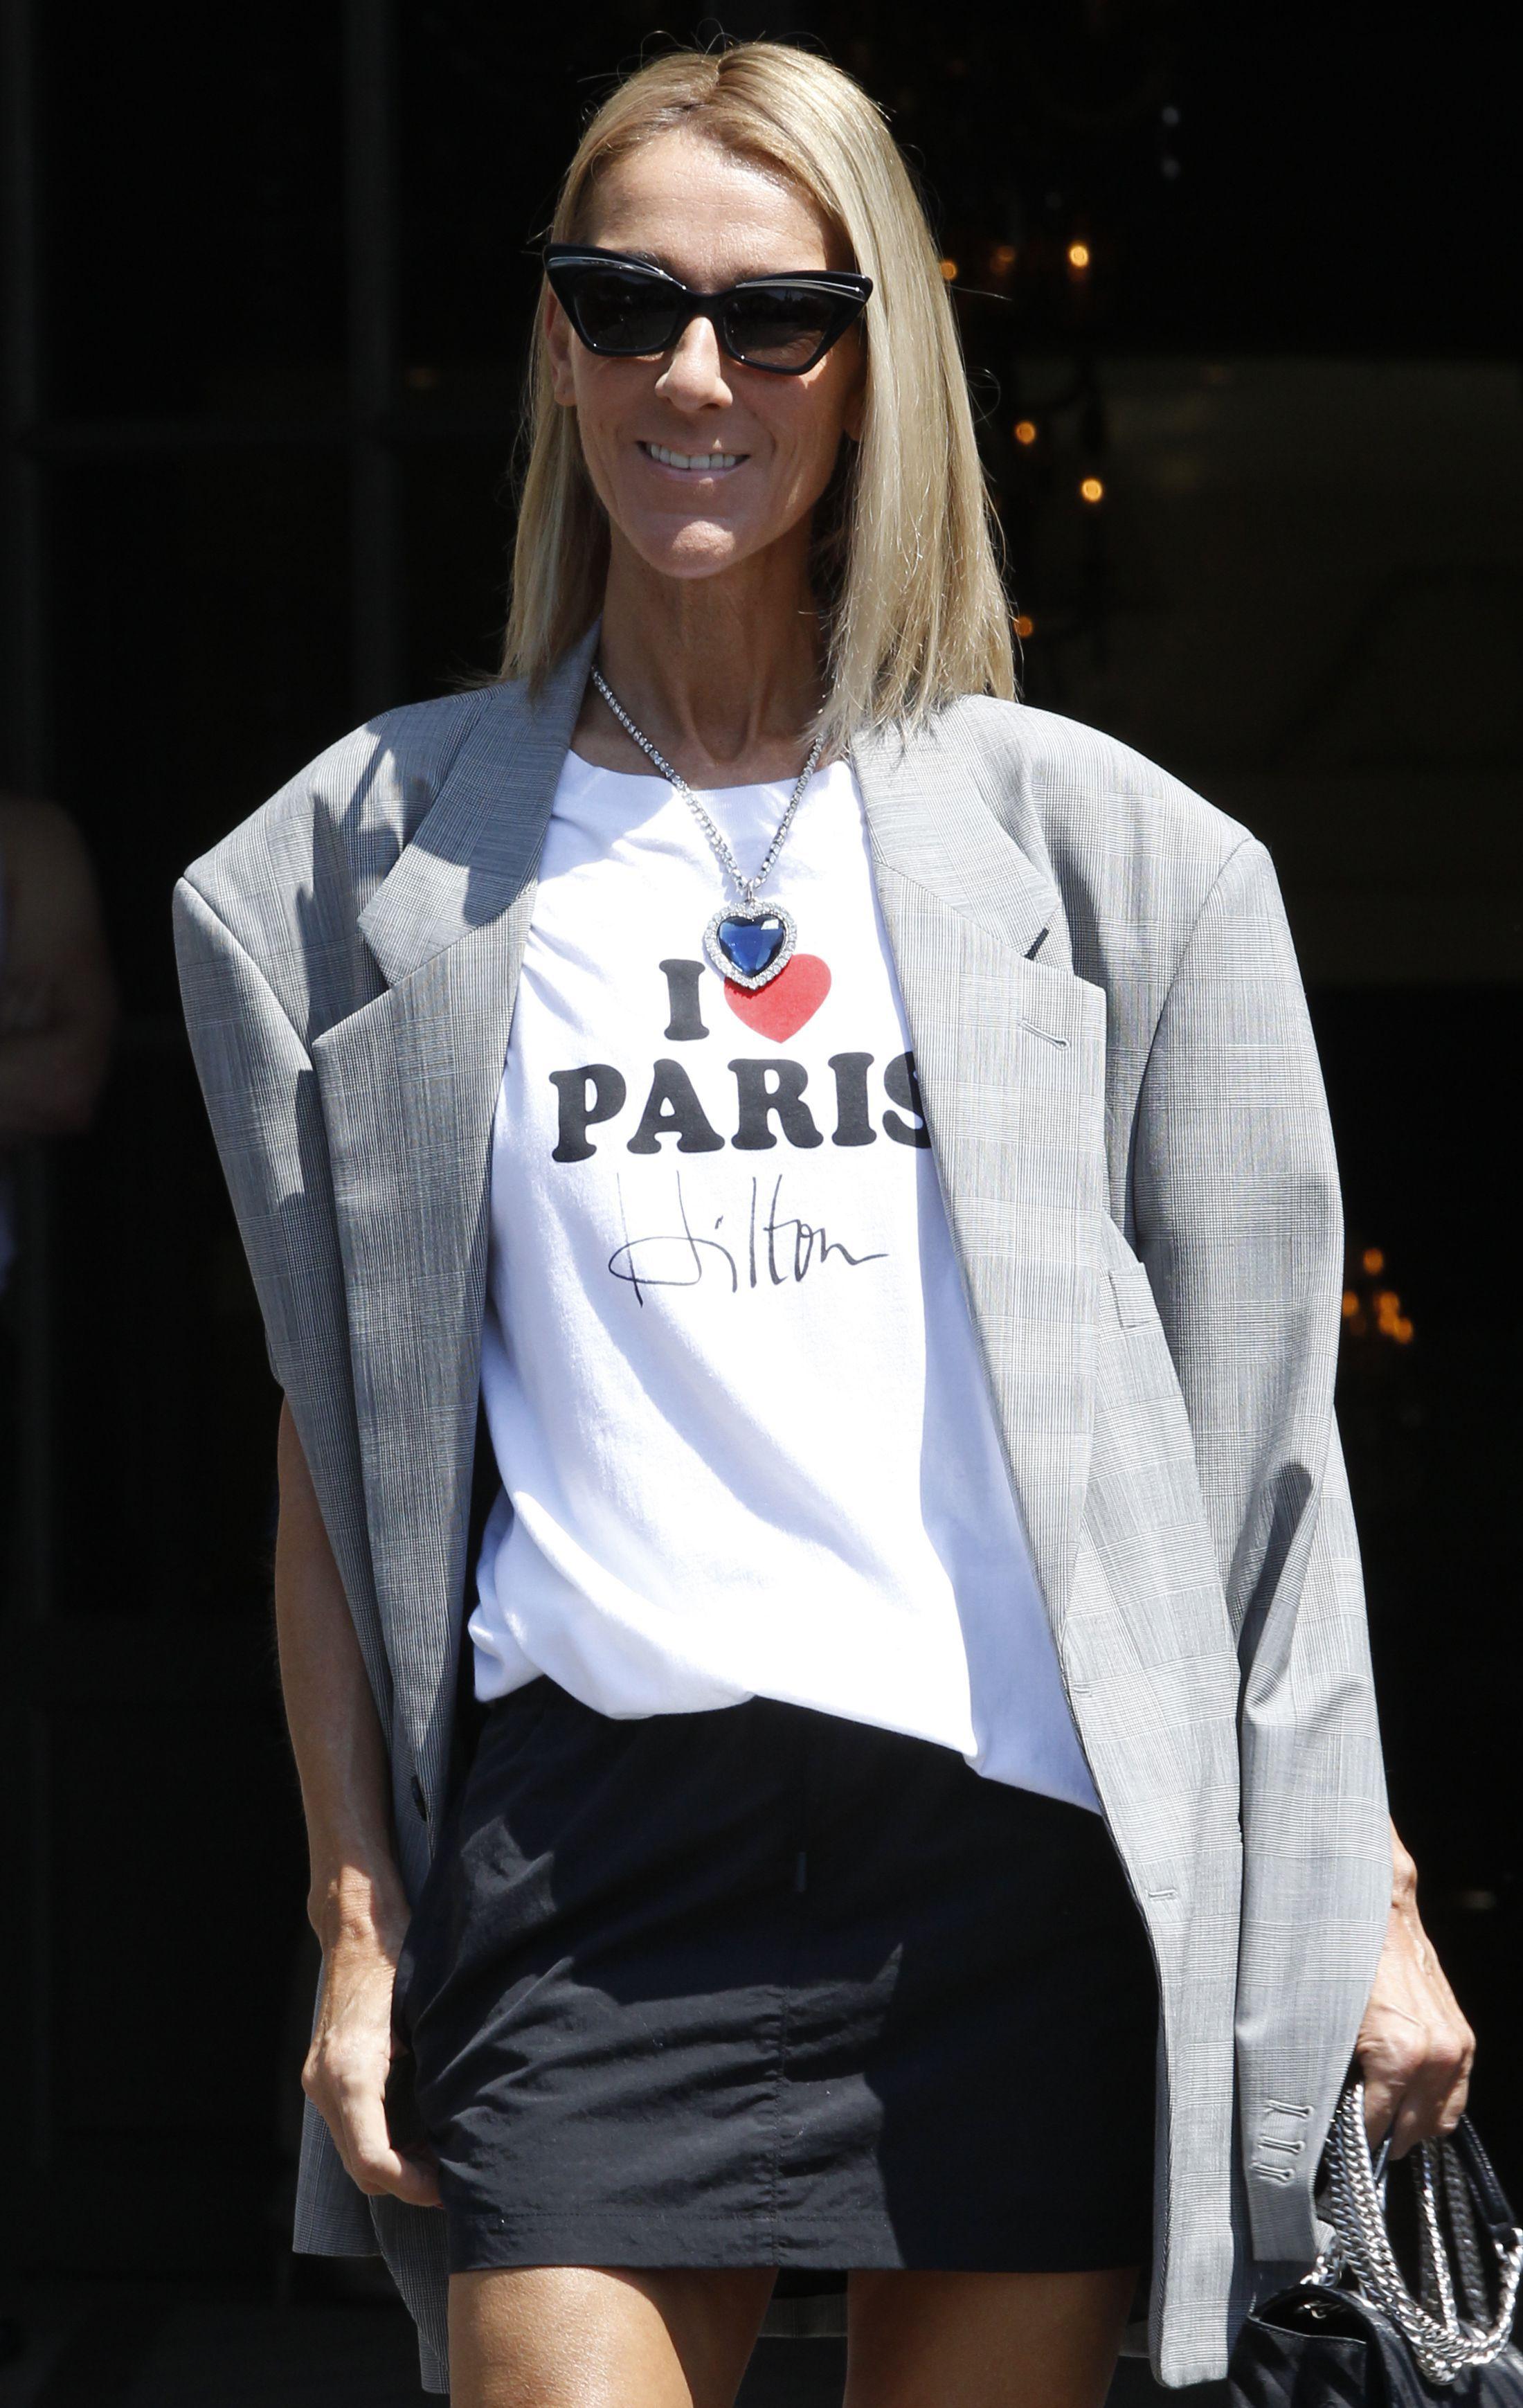 Celine DionCeline Dion out and about, Haute Couture Fashion Week, Paris, France - 03 Jul 2019Wearing Vetements